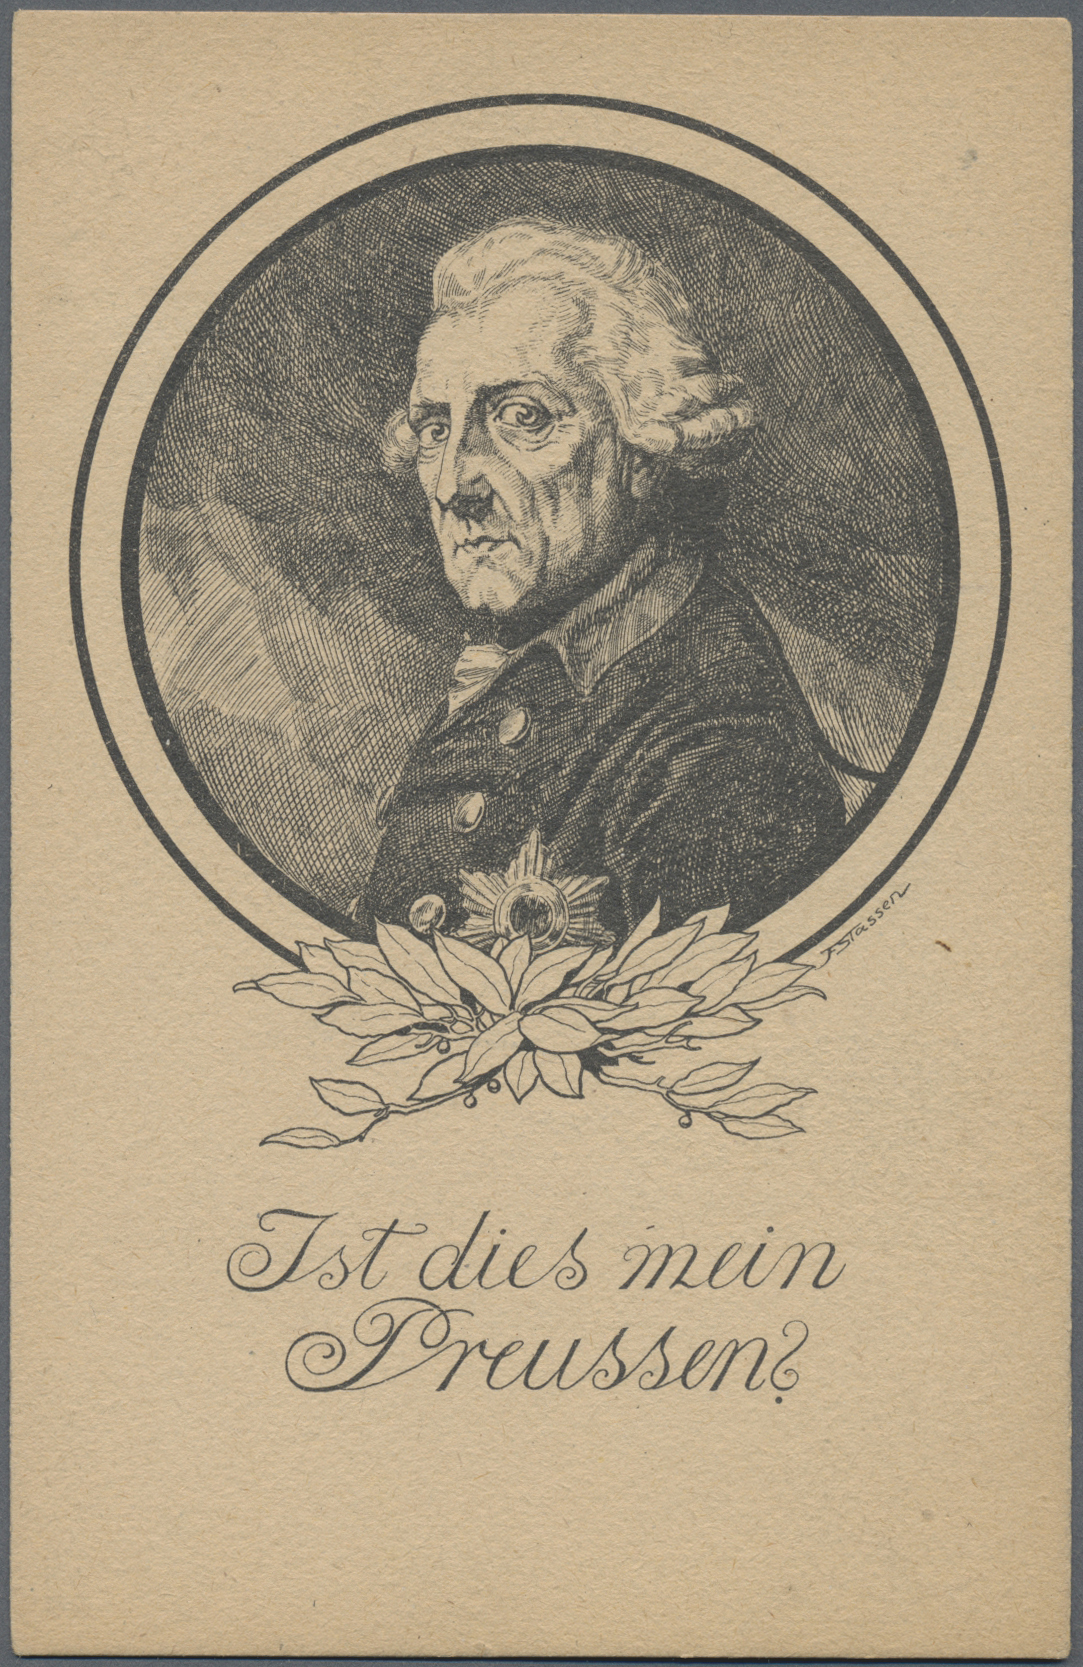 Lot 02504 - ansichtskarten: politik / politics  -  Auktionshaus Christoph Gärtner GmbH & Co. KG Special auction